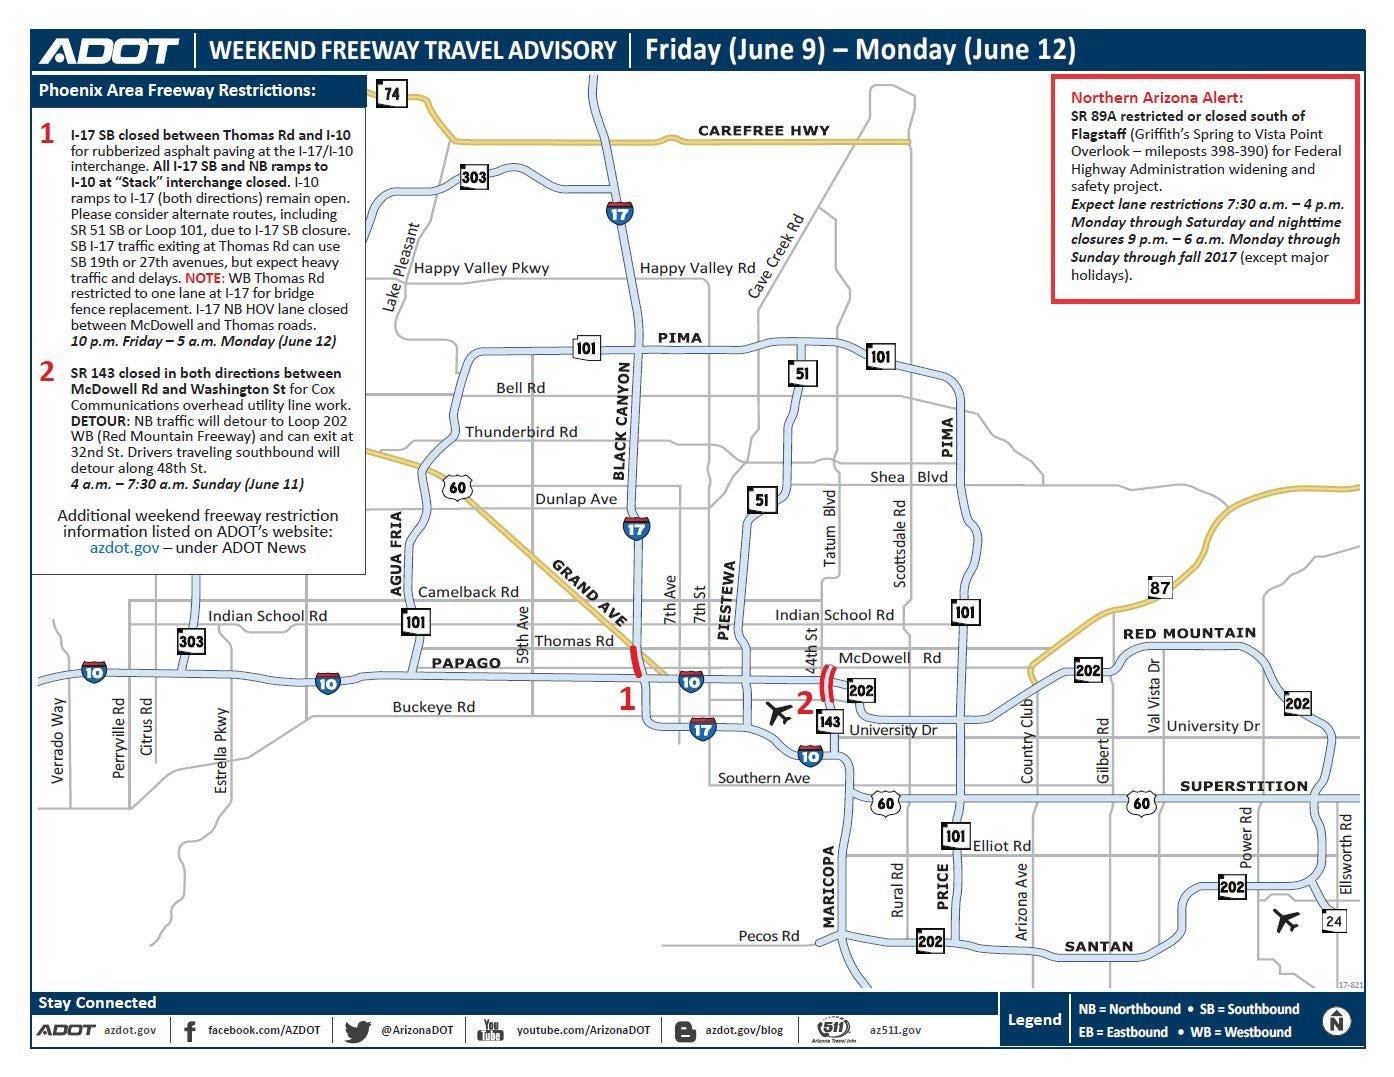 Adot Weekend Freeway Travel Advisory (June 9-12) - Arizona To Do List Mon To Friday 15-19 June